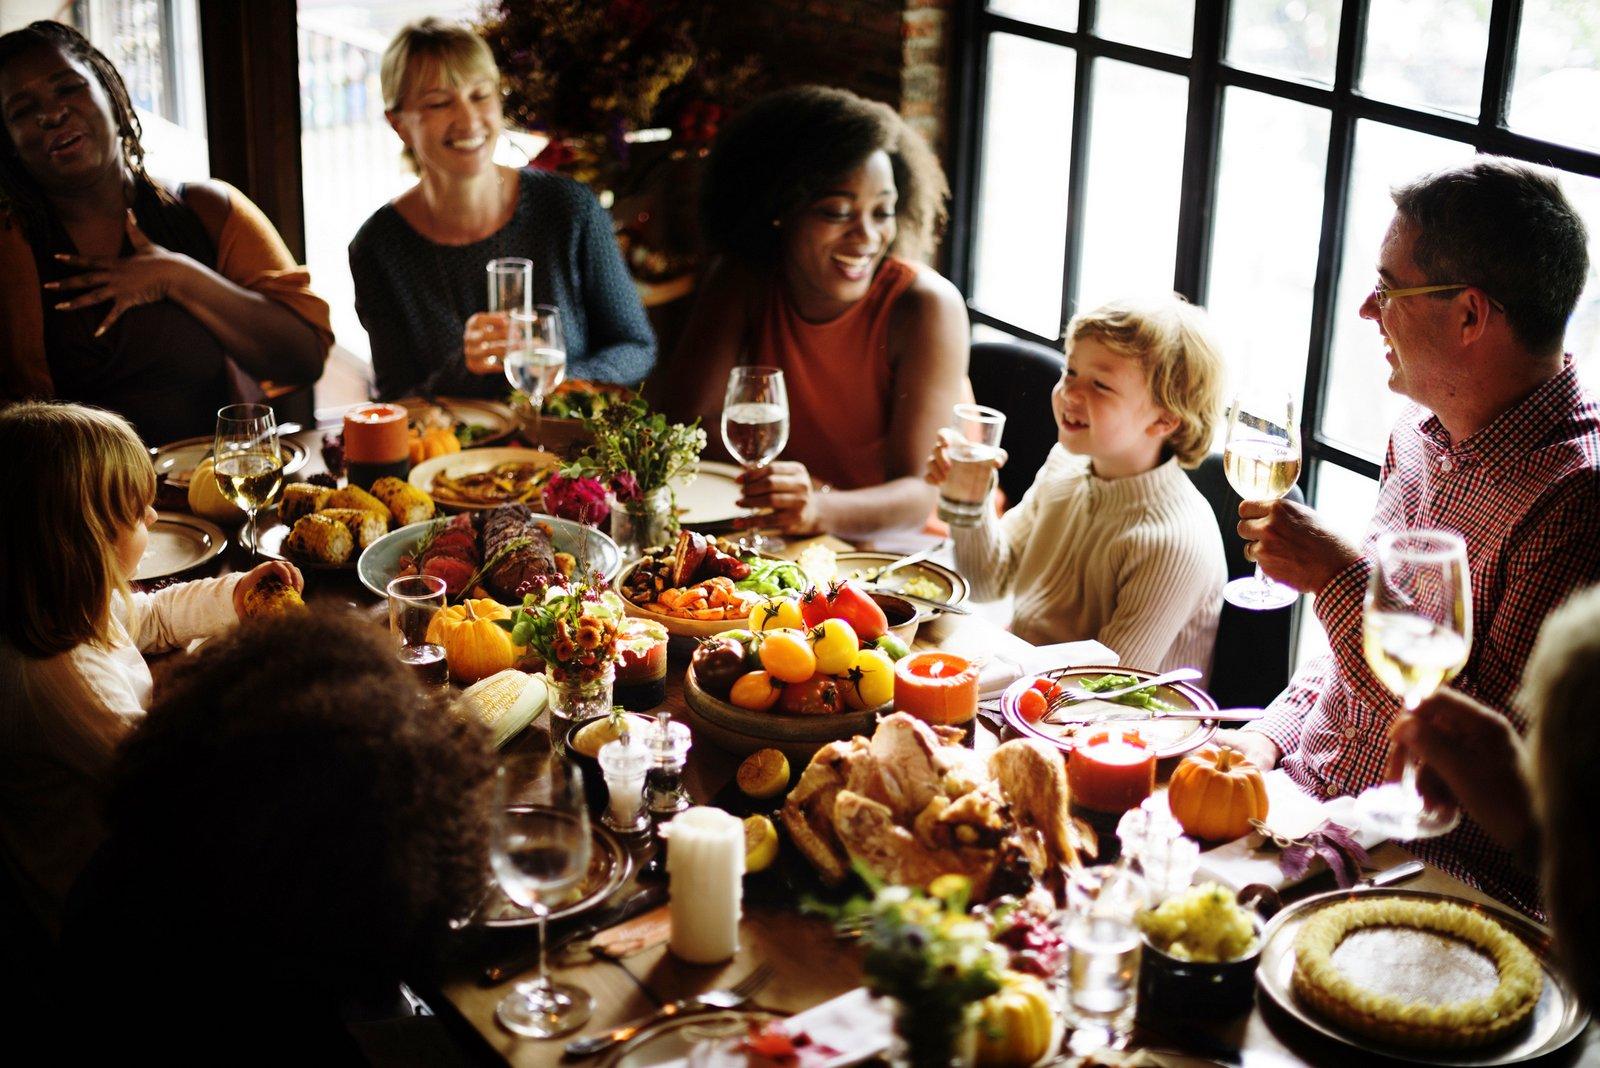 Thanksgiving-dinner-friends-and-family-at-potluck-G.jpg